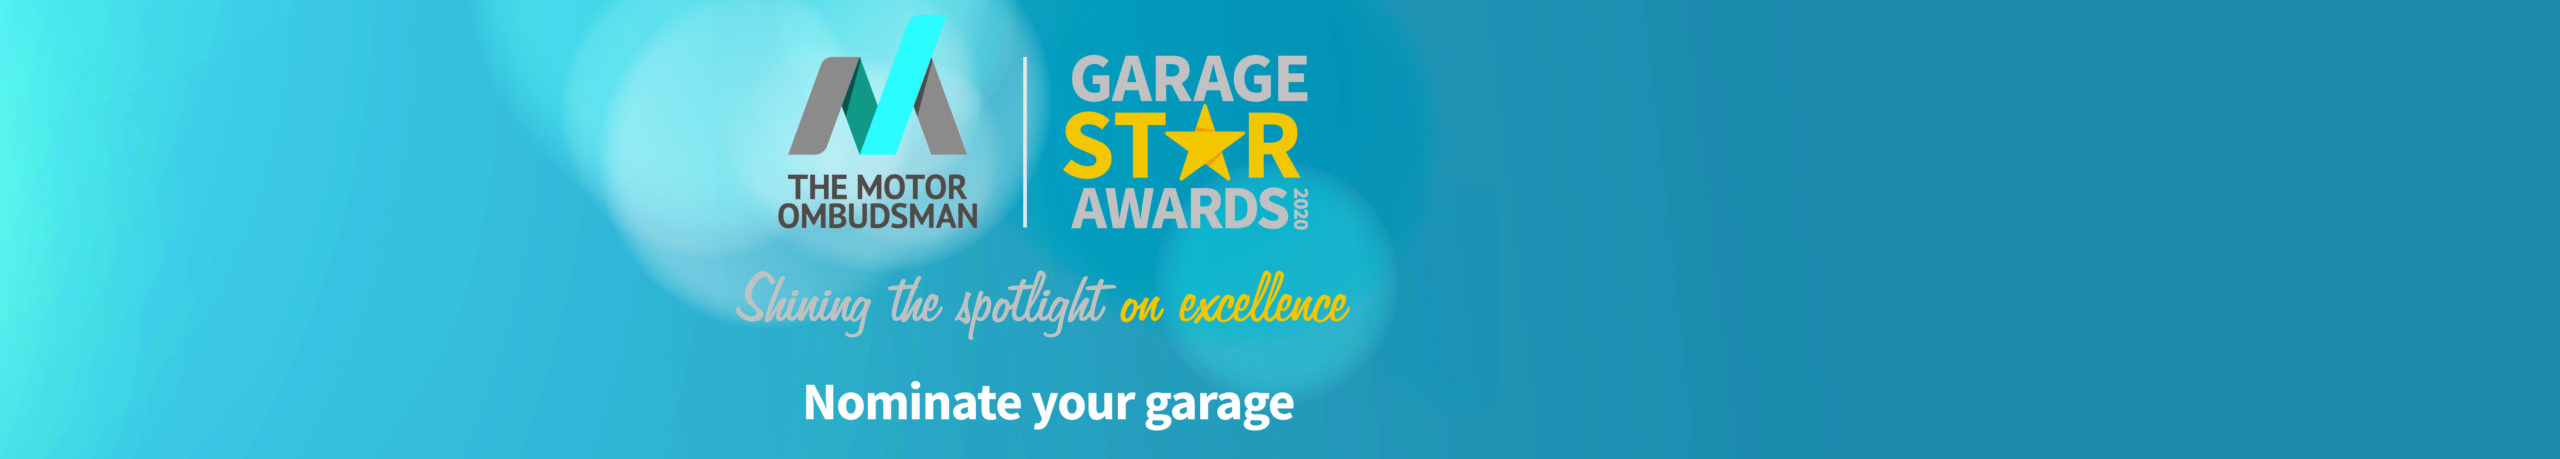 Garage Star Awards